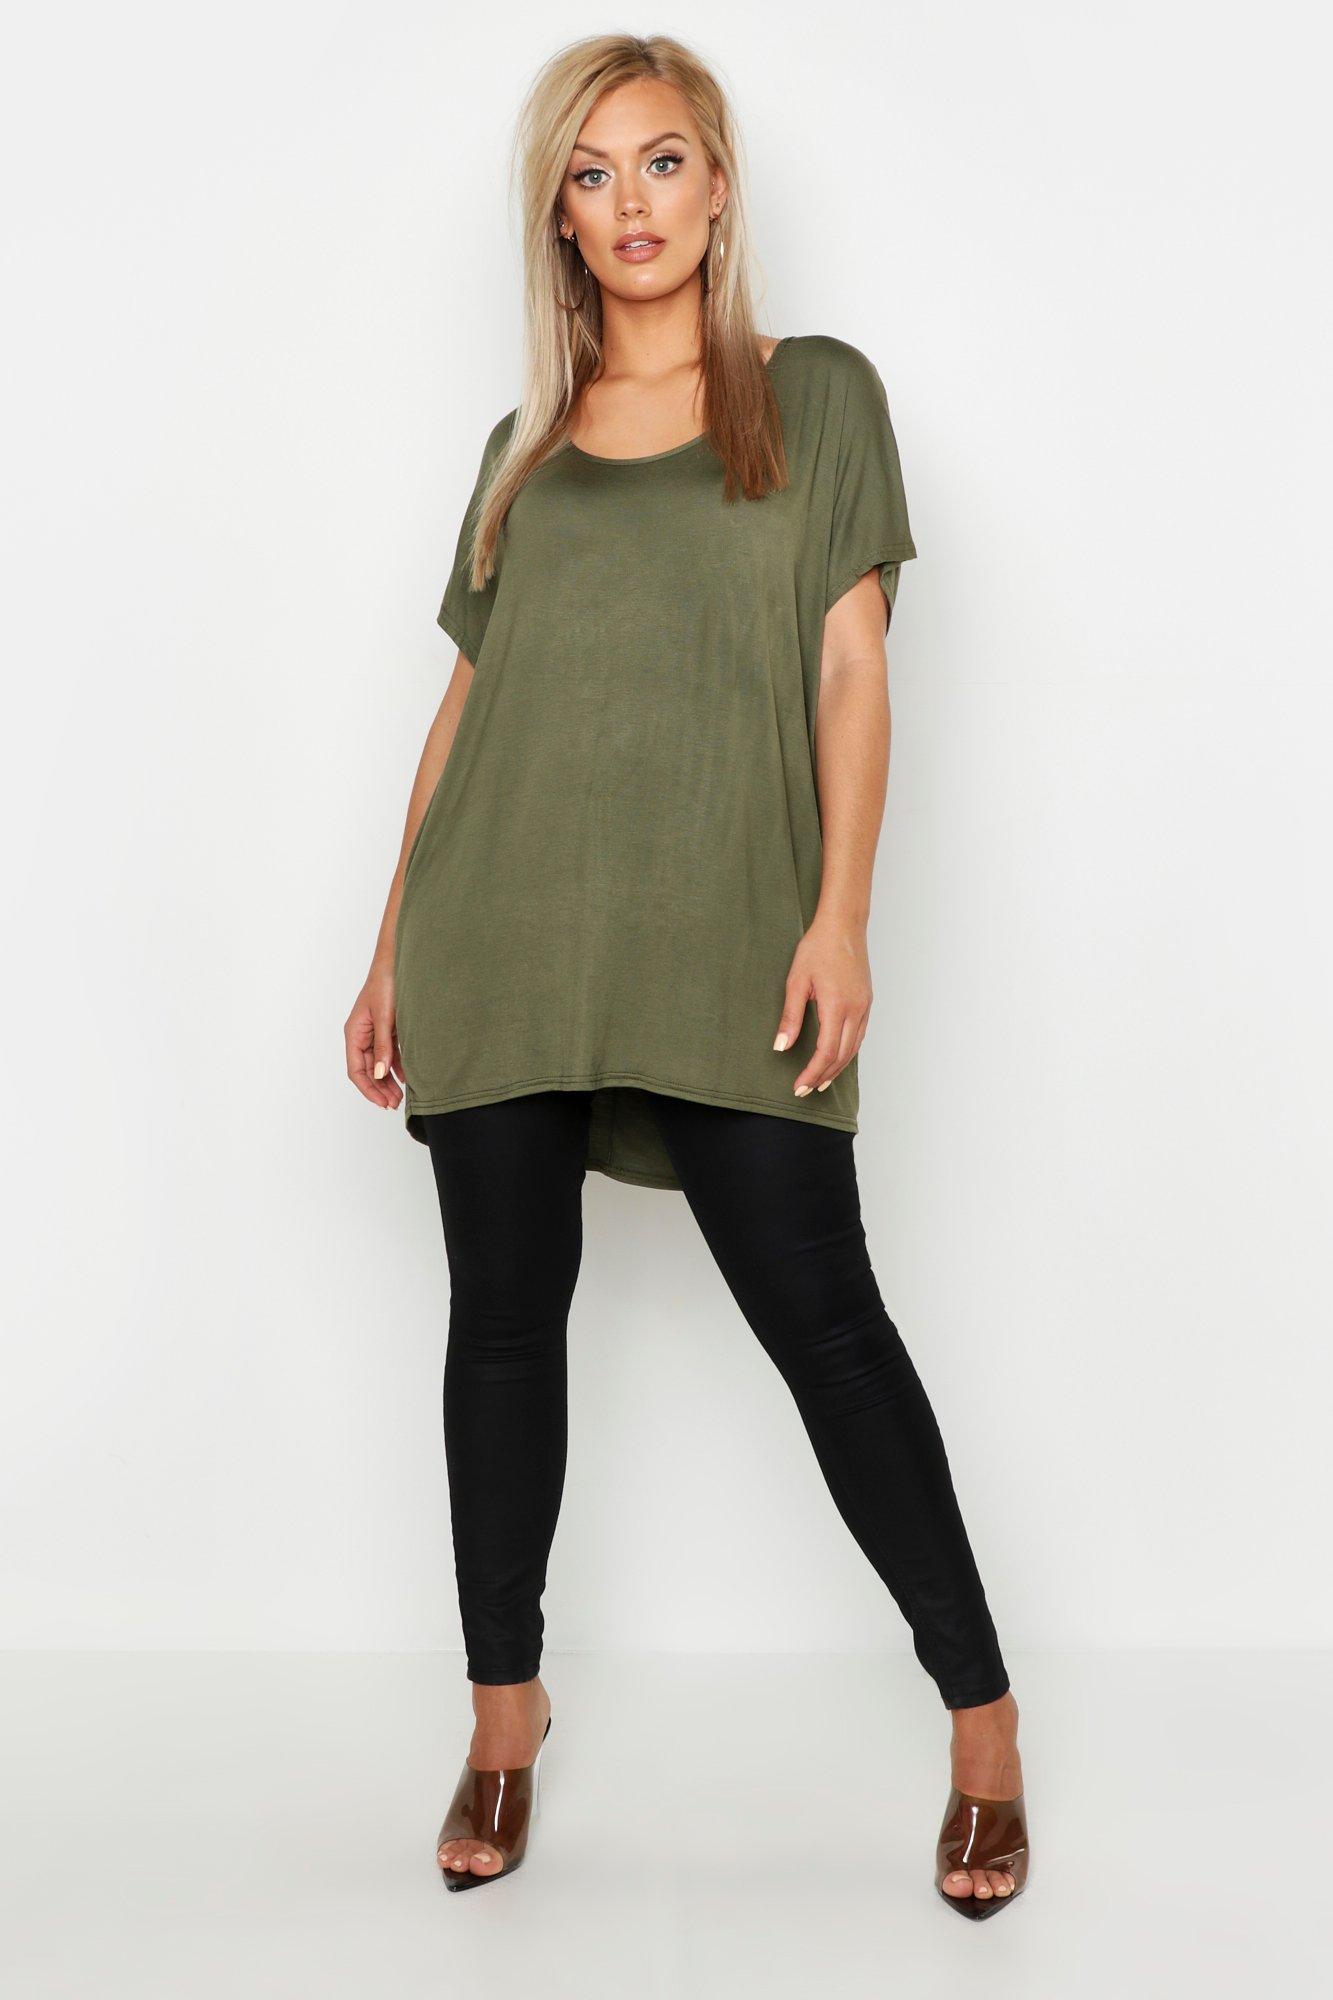 Womens Plus Übergroßes T-Shirt - khaki - 56, Khaki - Boohoo.com